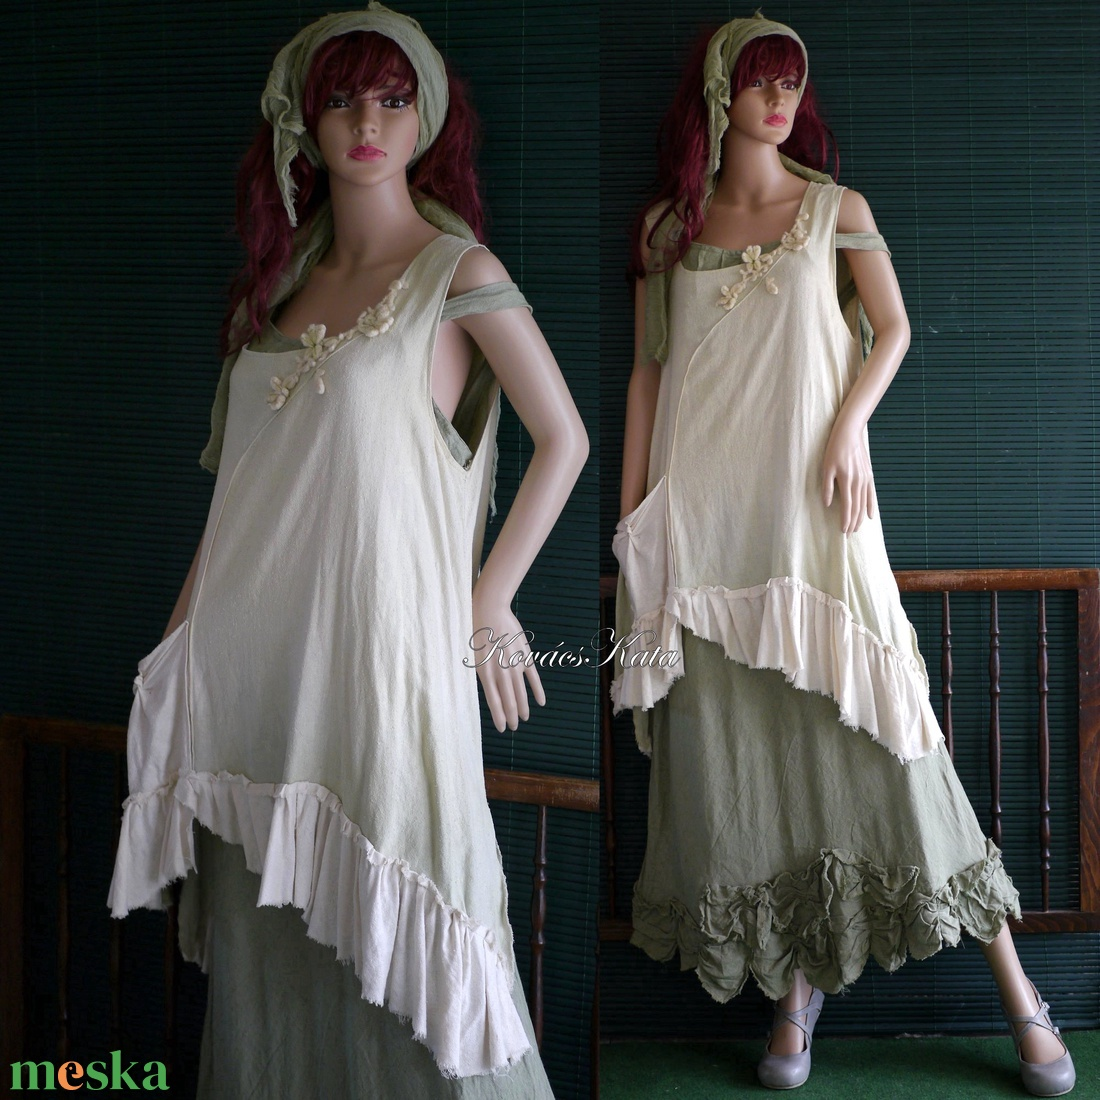 ILMA - burett-selyem tunika, shabby chic kötényruha - ruha & divat - női ruha - tunika - Meska.hu